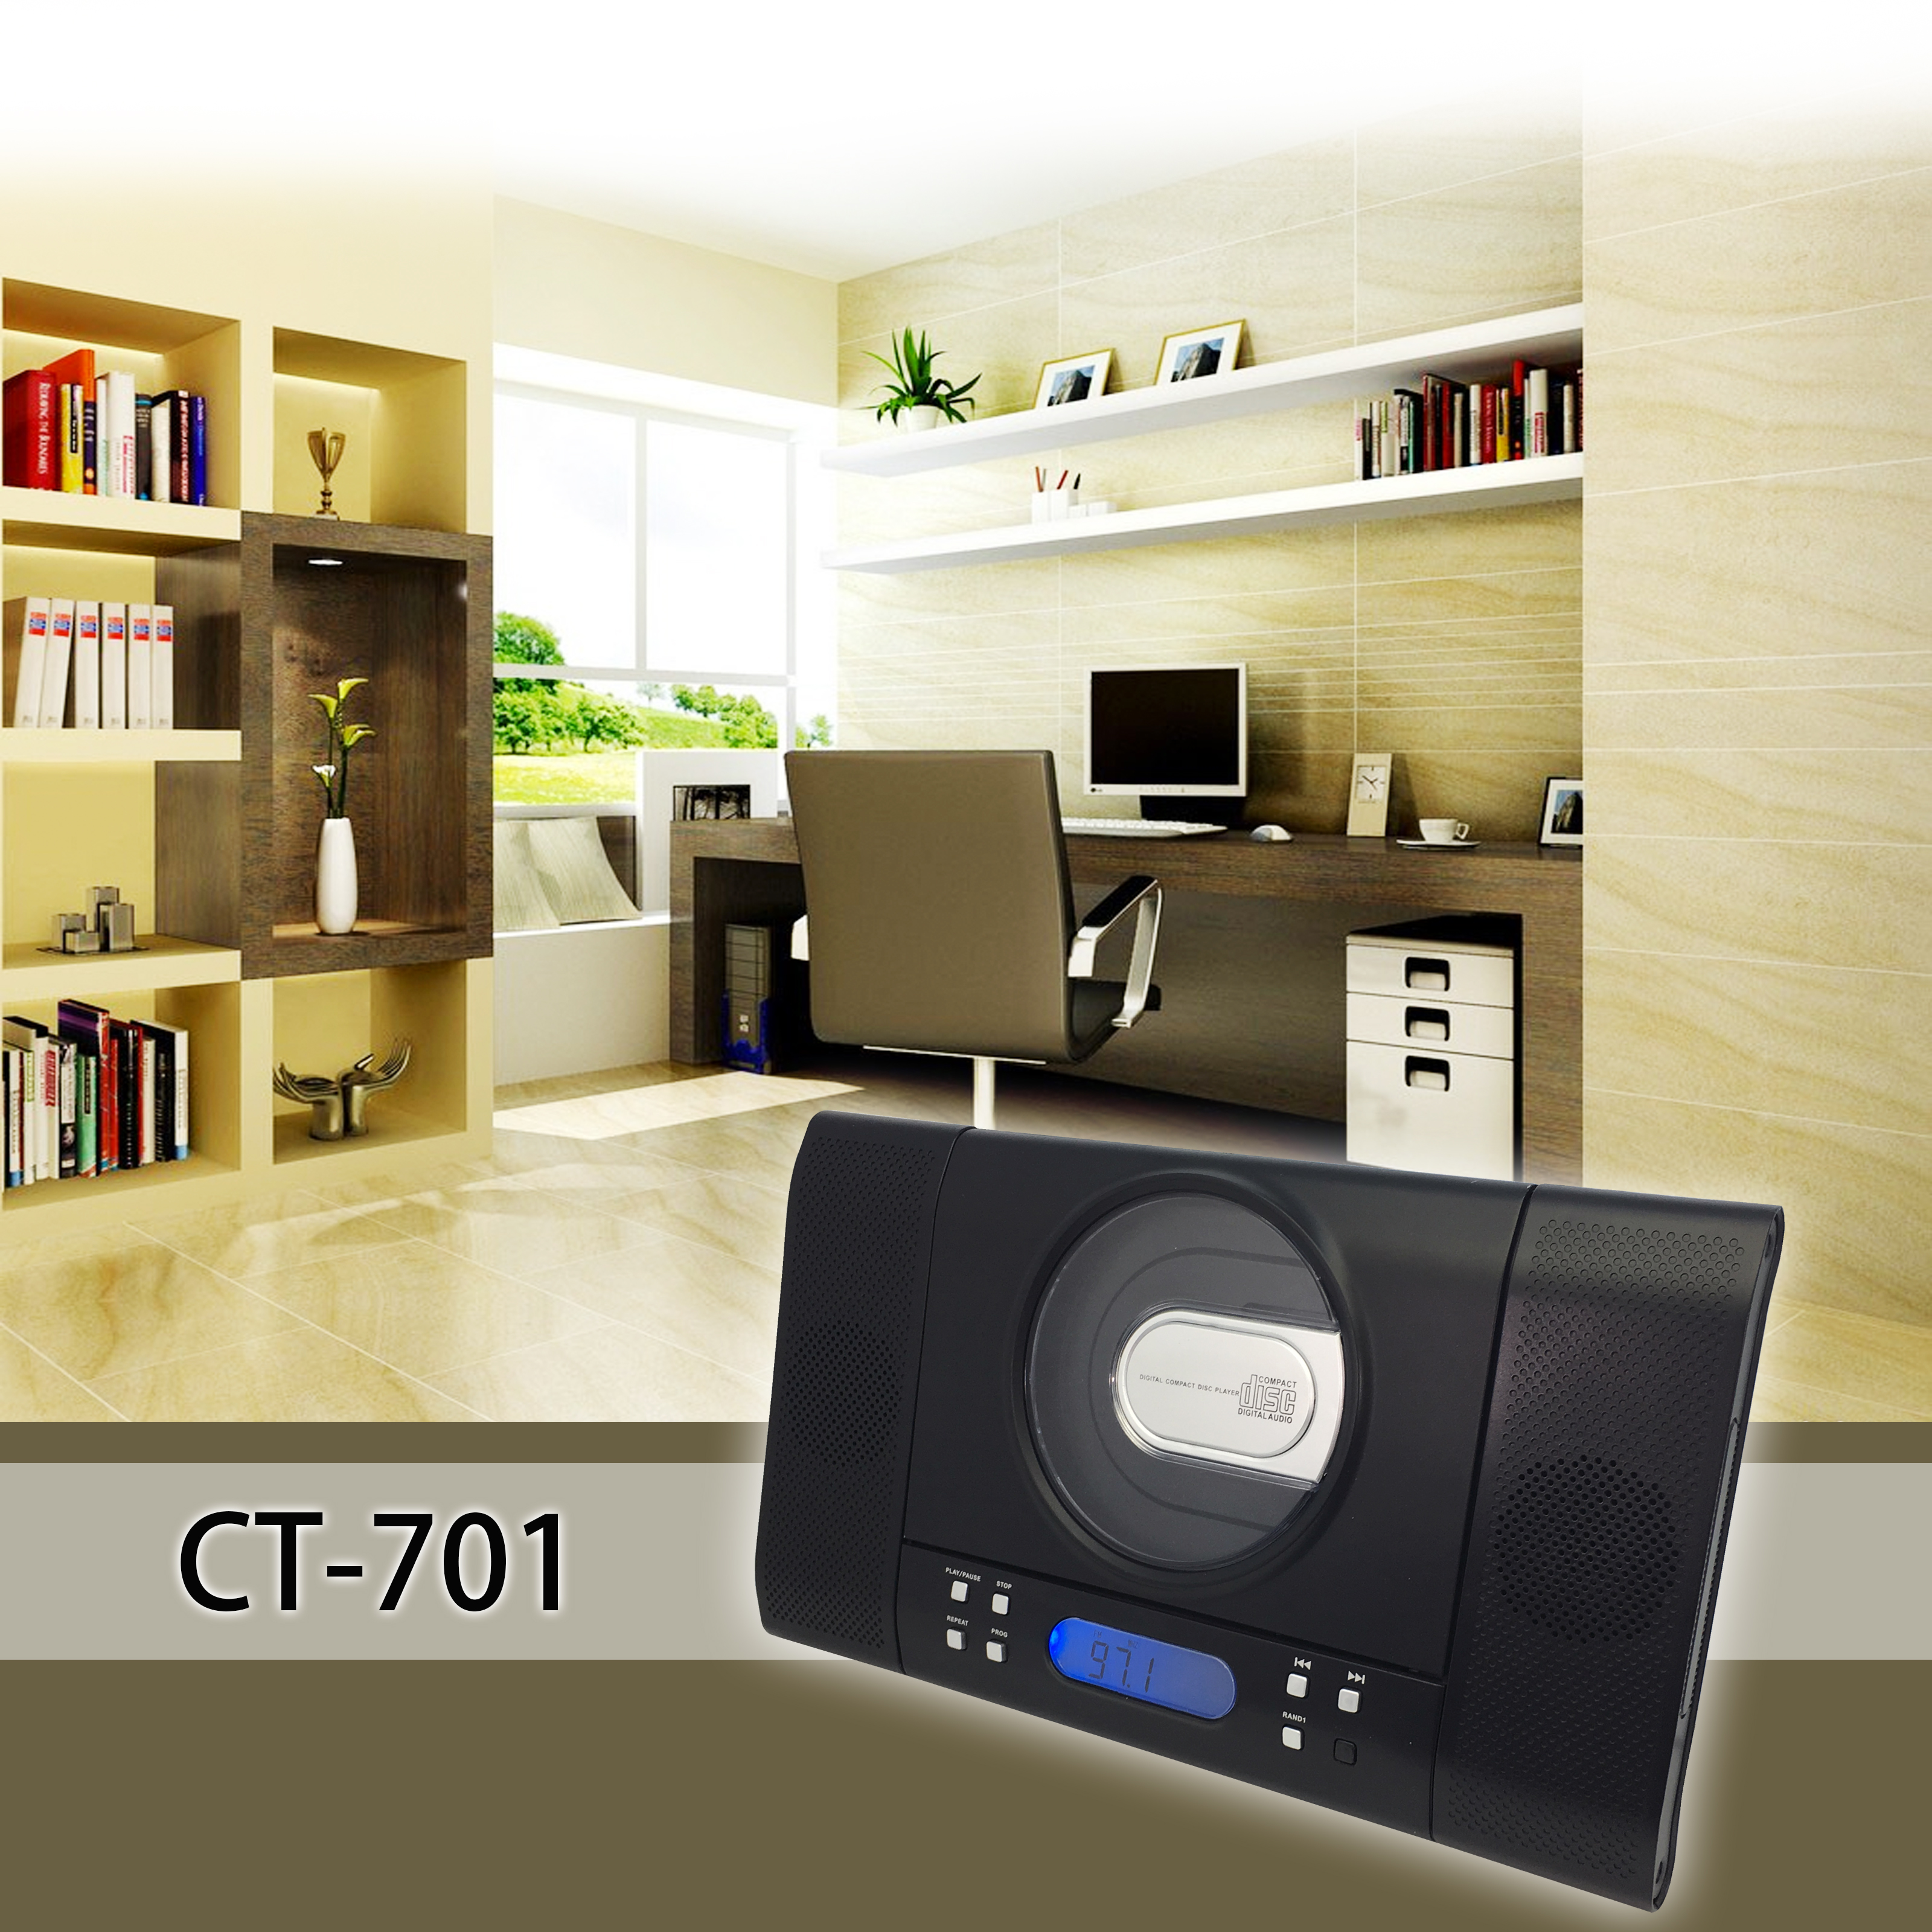 CT-701 Study Room.jpg